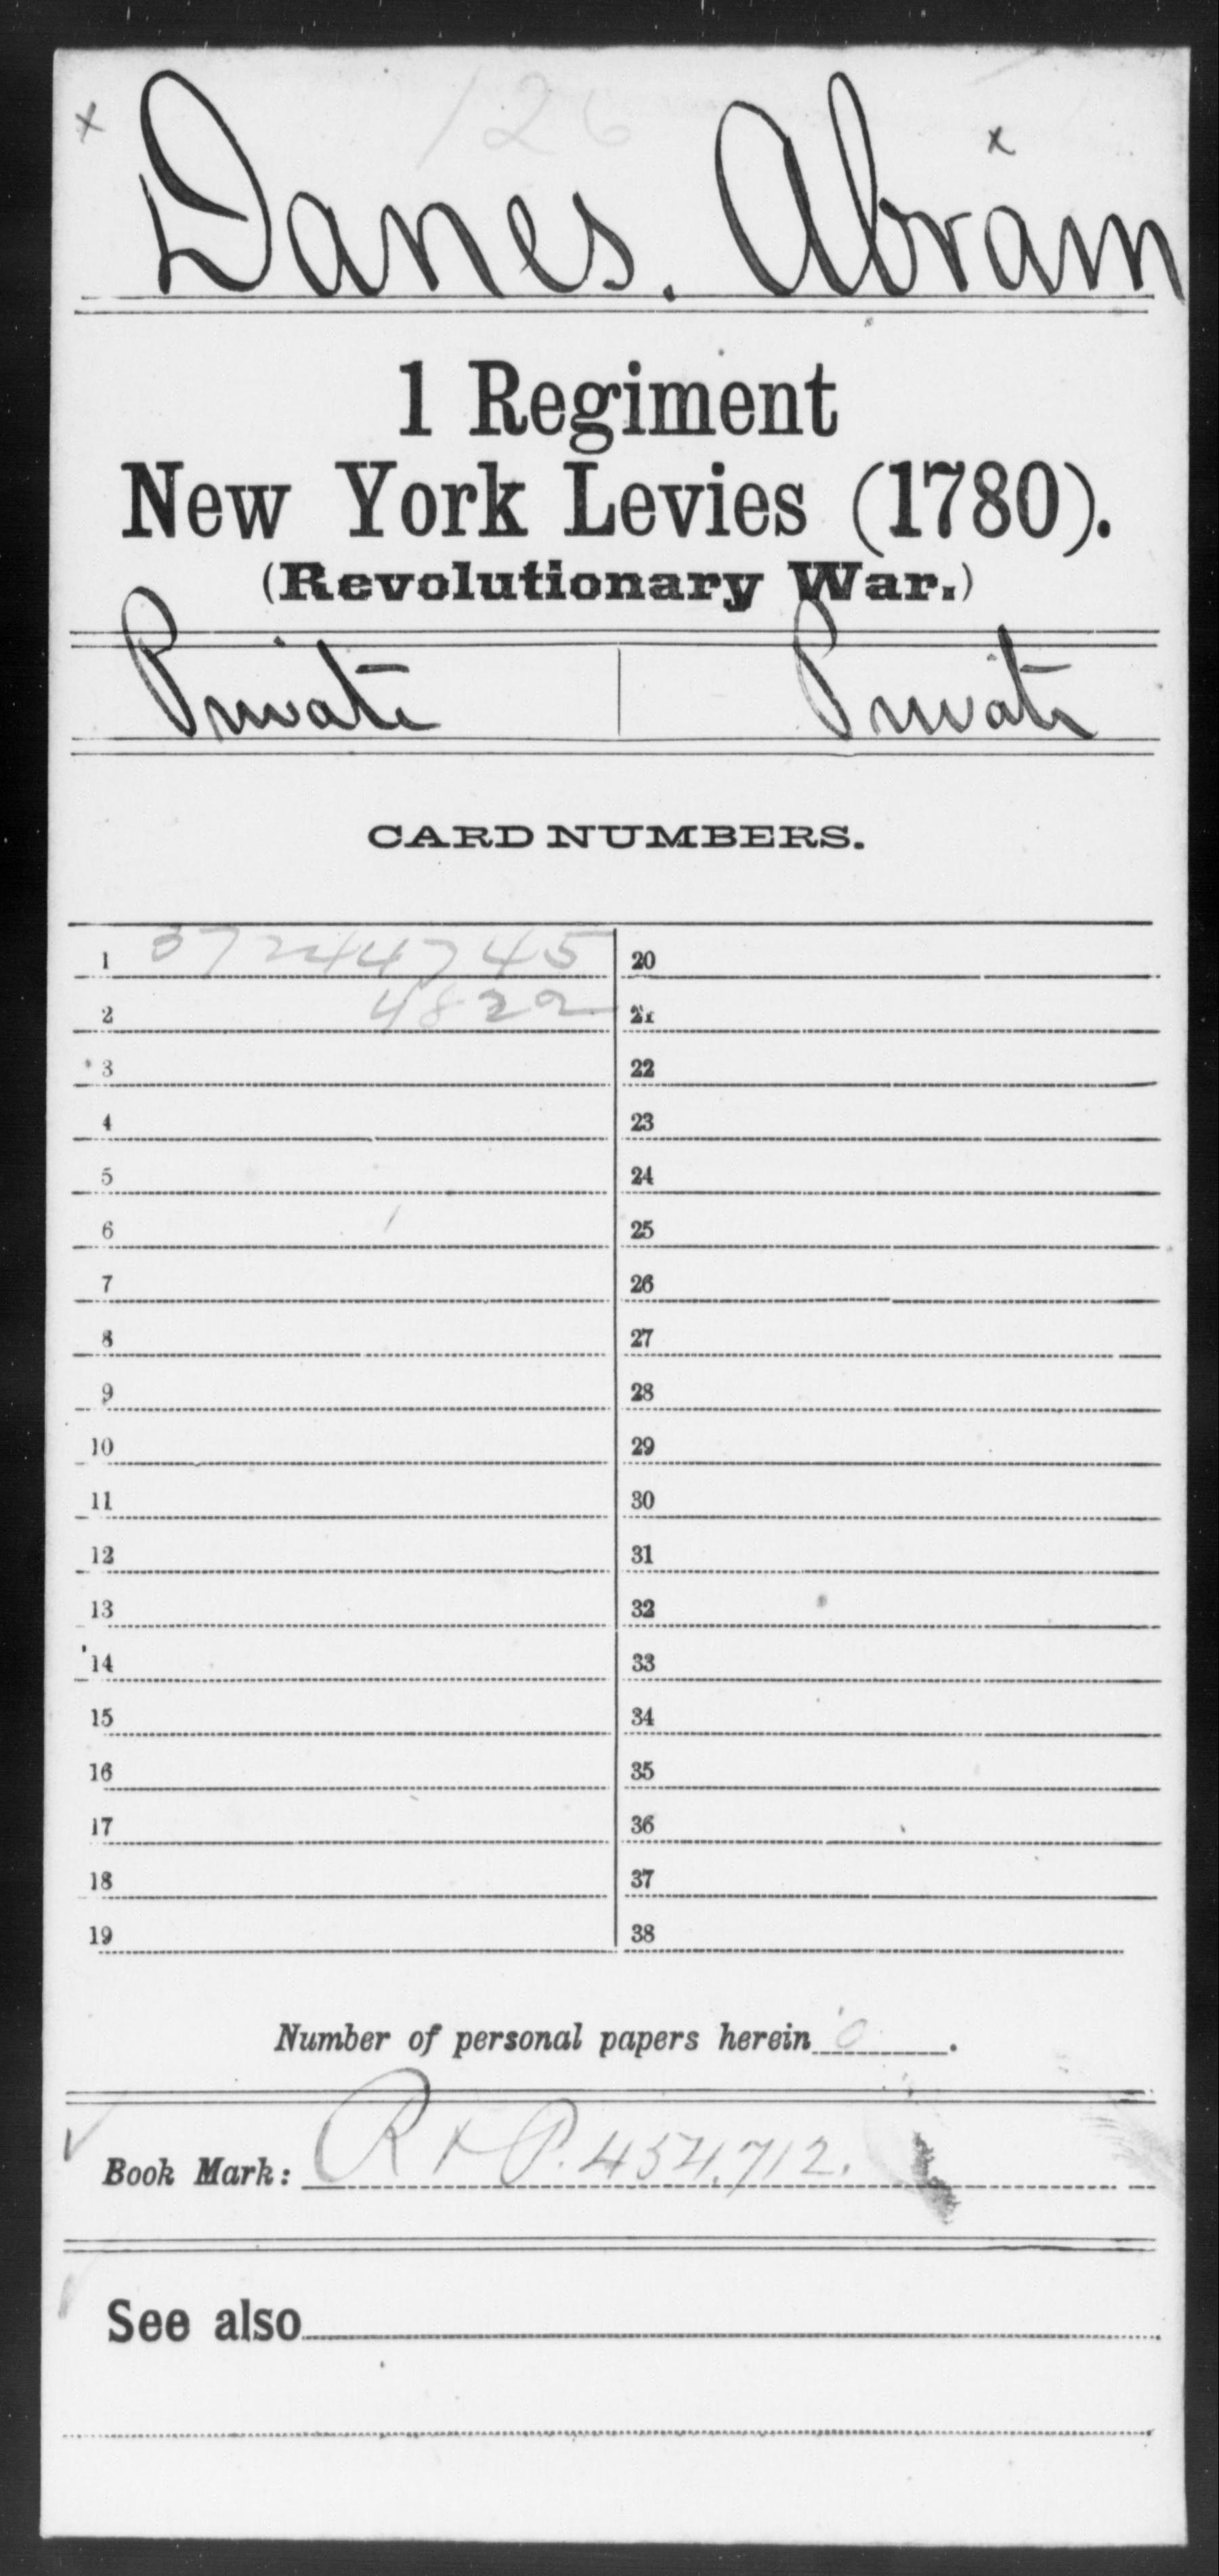 Danes, Abram - New York - First Regiment, New York Levies (1780)